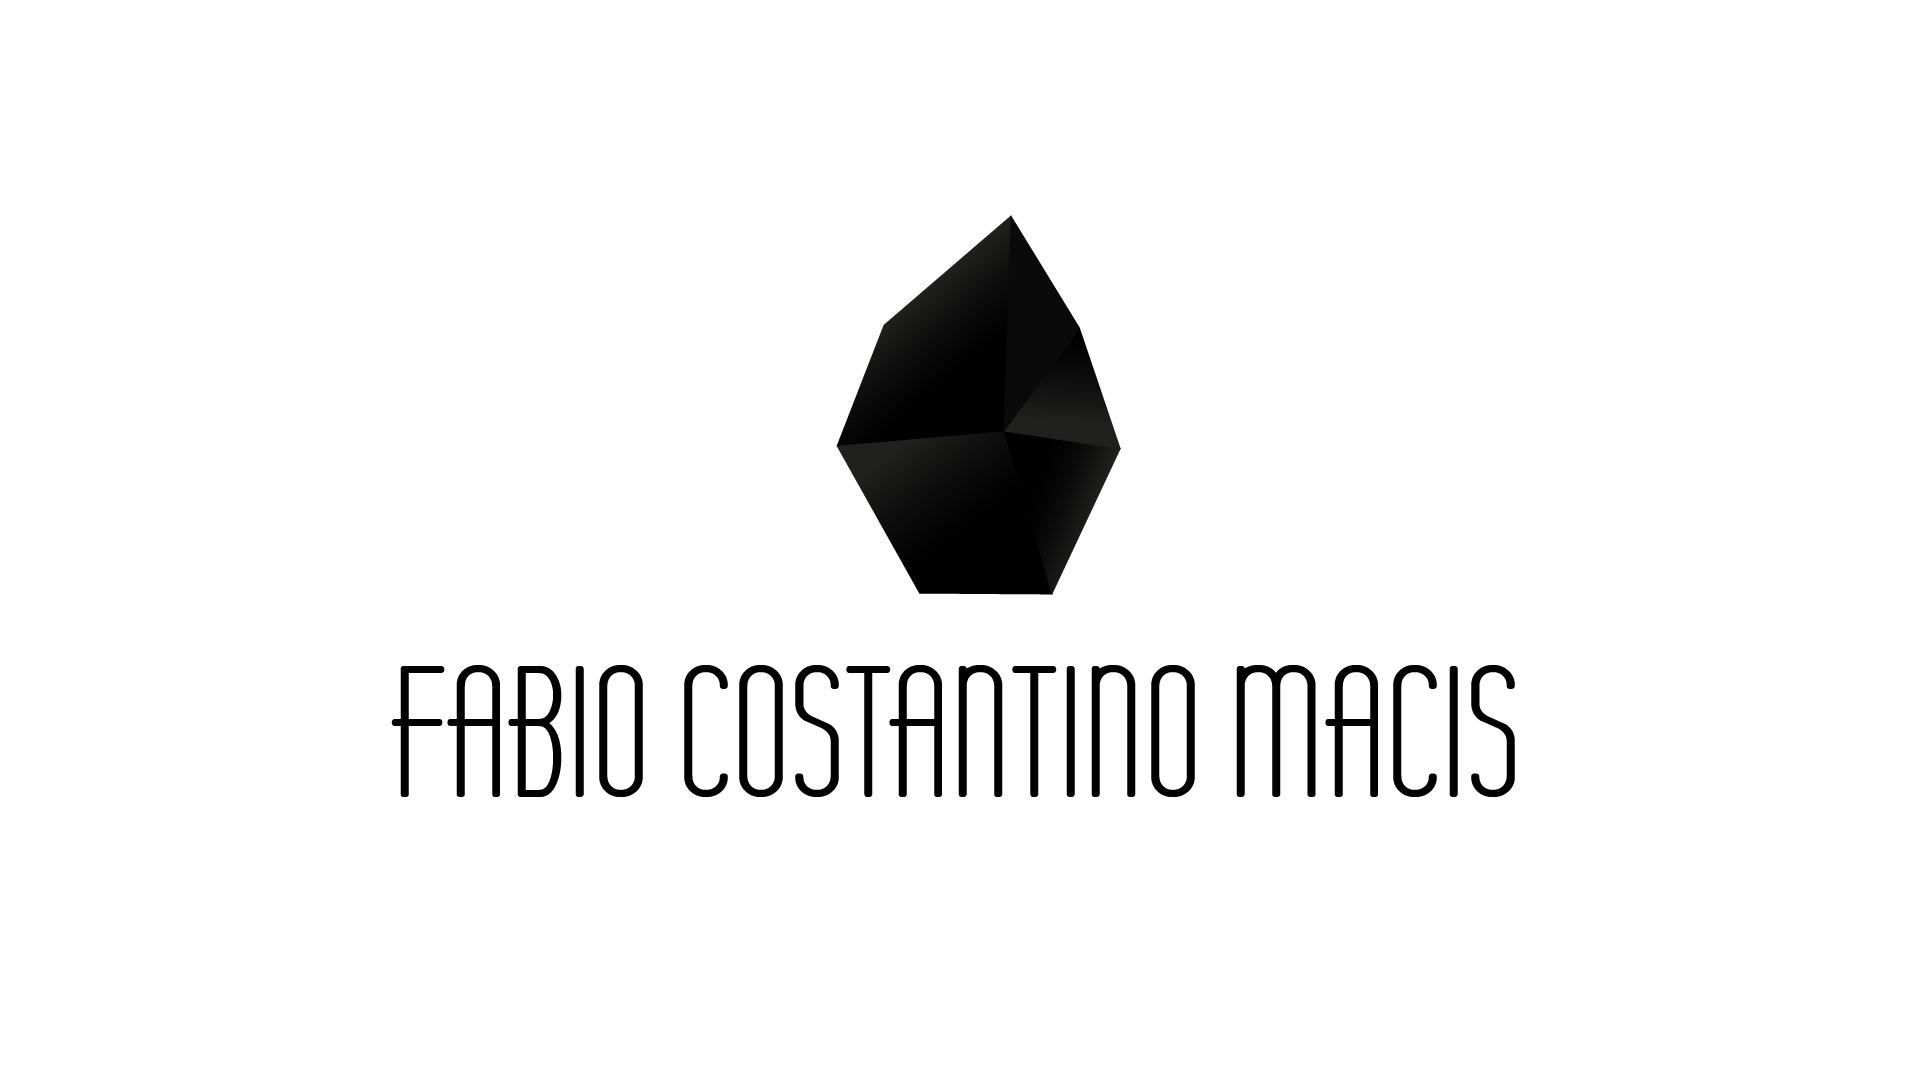 Logo Fabio Costantino Macis (3 images)